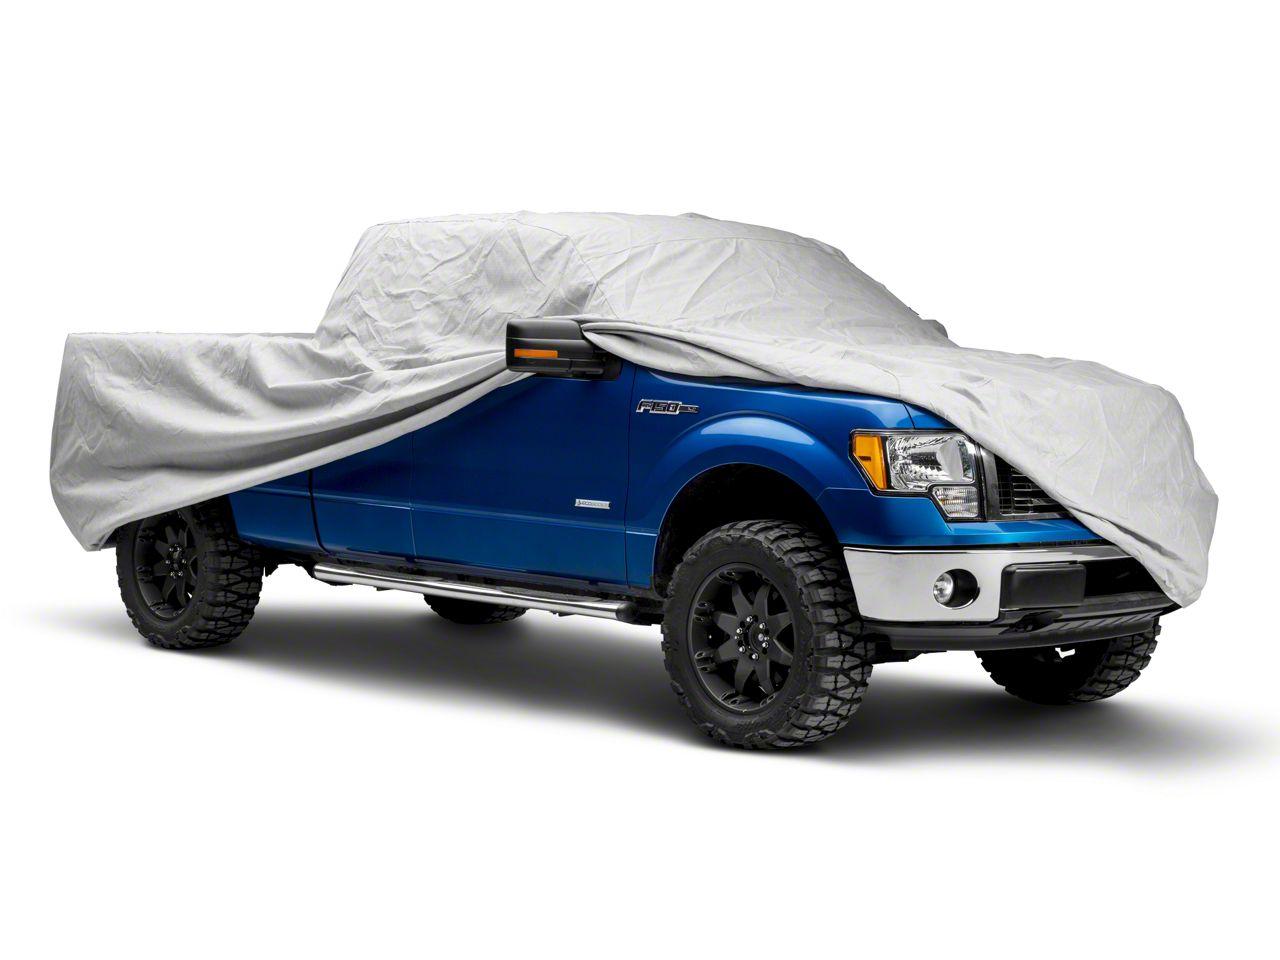 Covercraft Premium Noah Truck Cover - Gray (04-14 F-150)